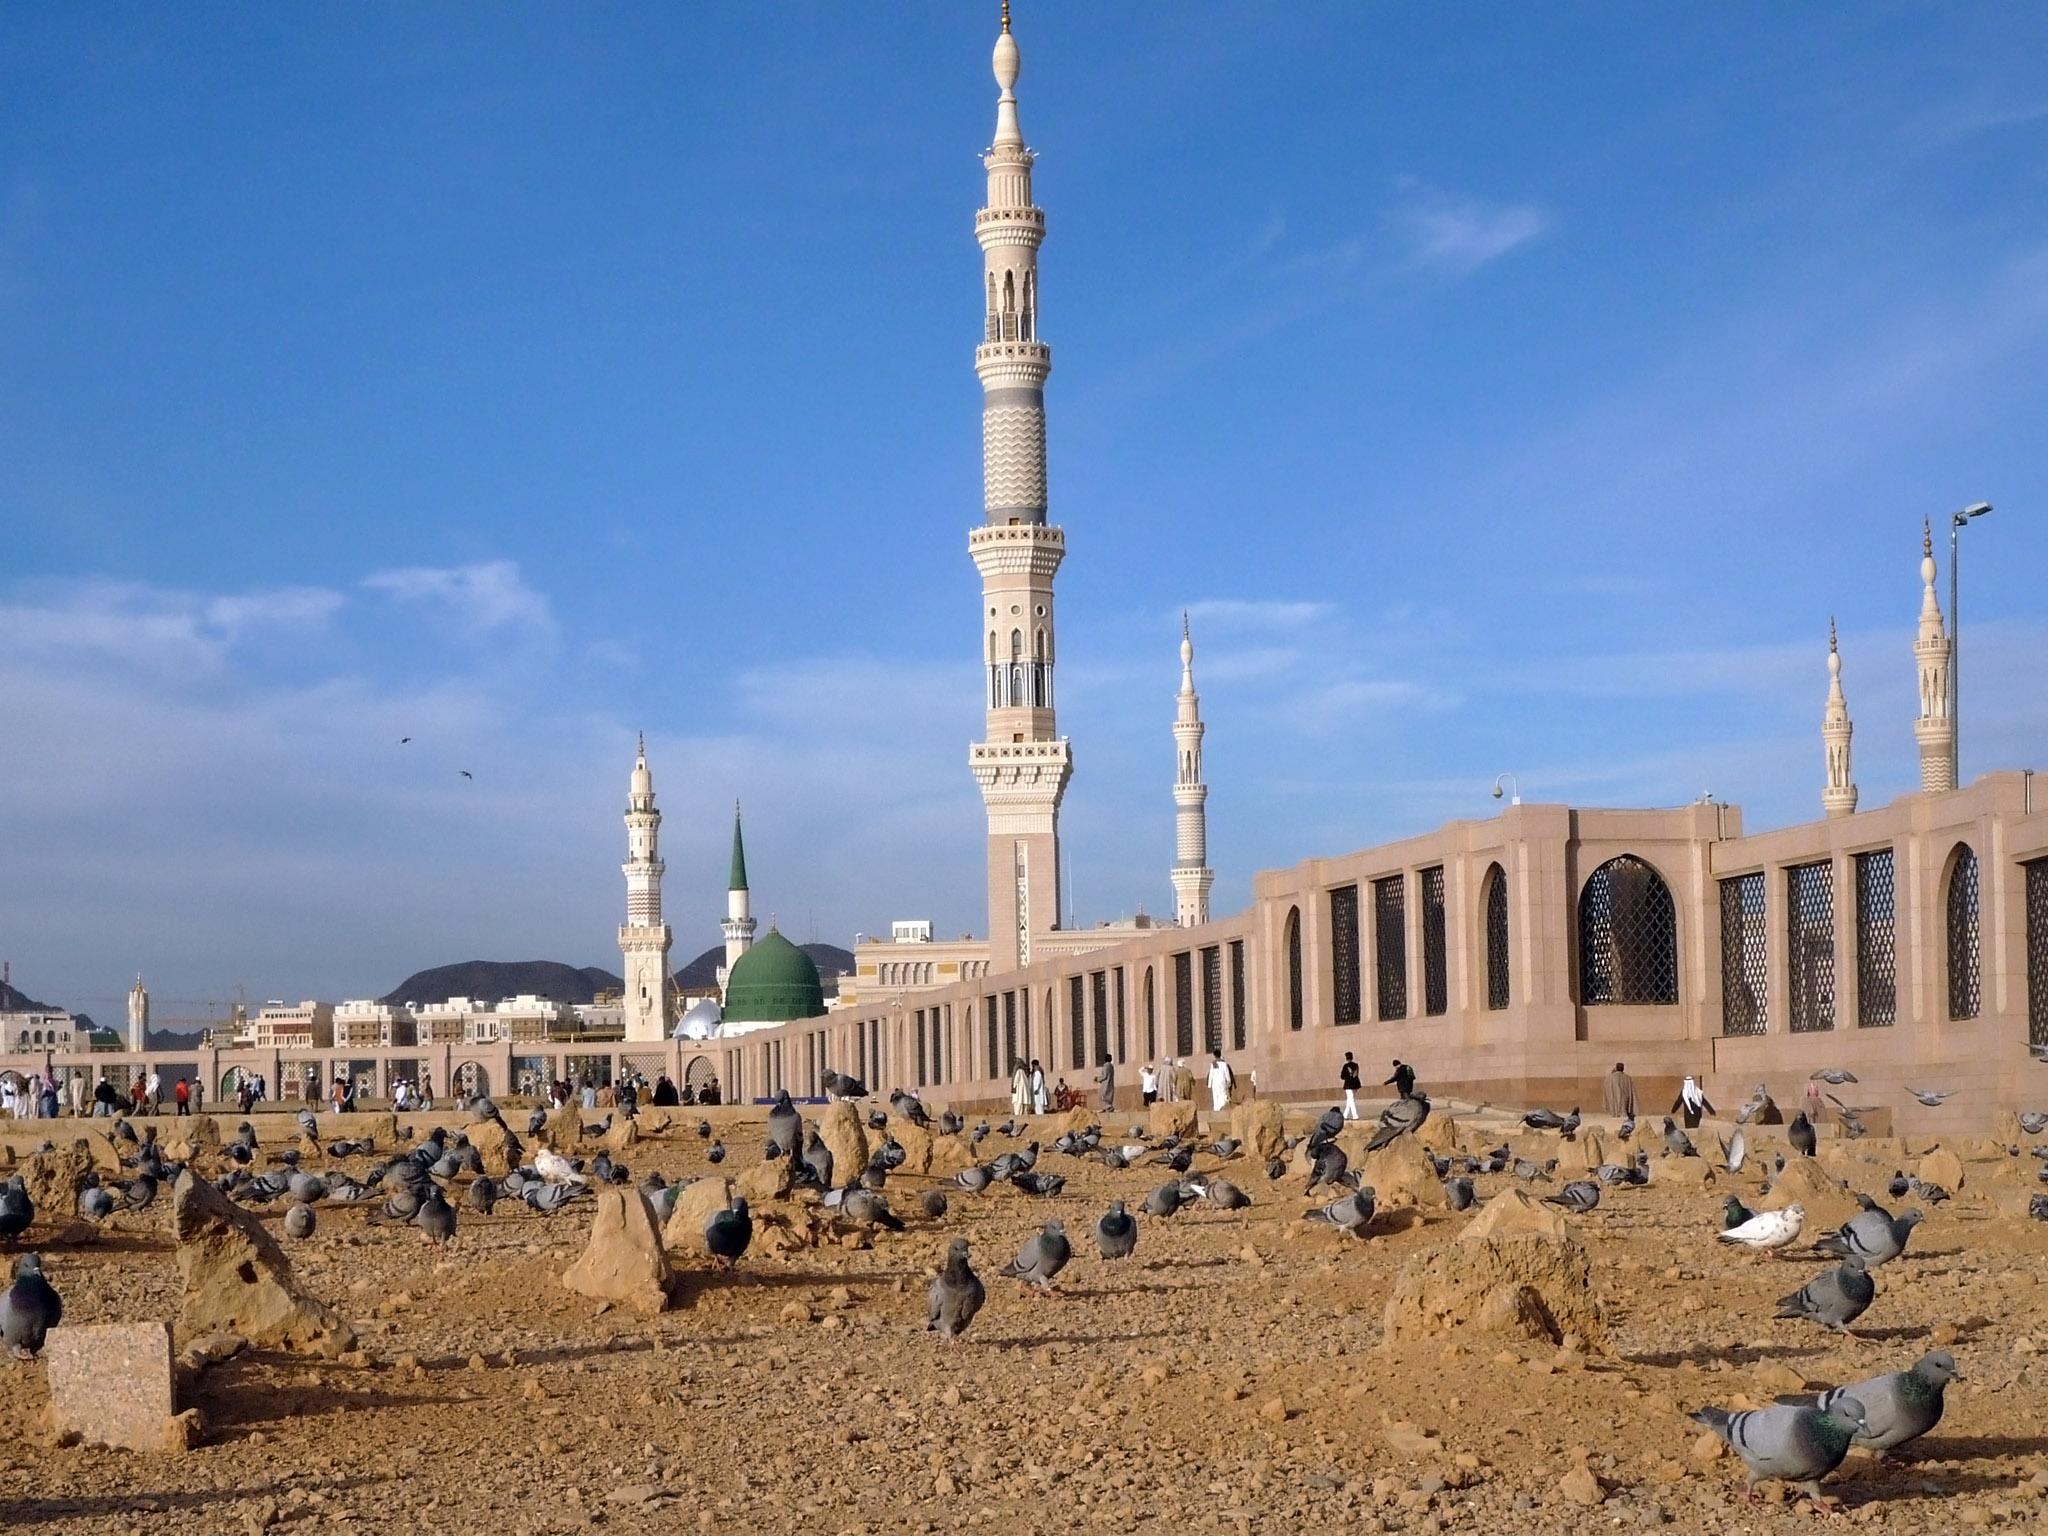 Did Imam Husayn leave behind a sick daughter named Fatima in Medina?